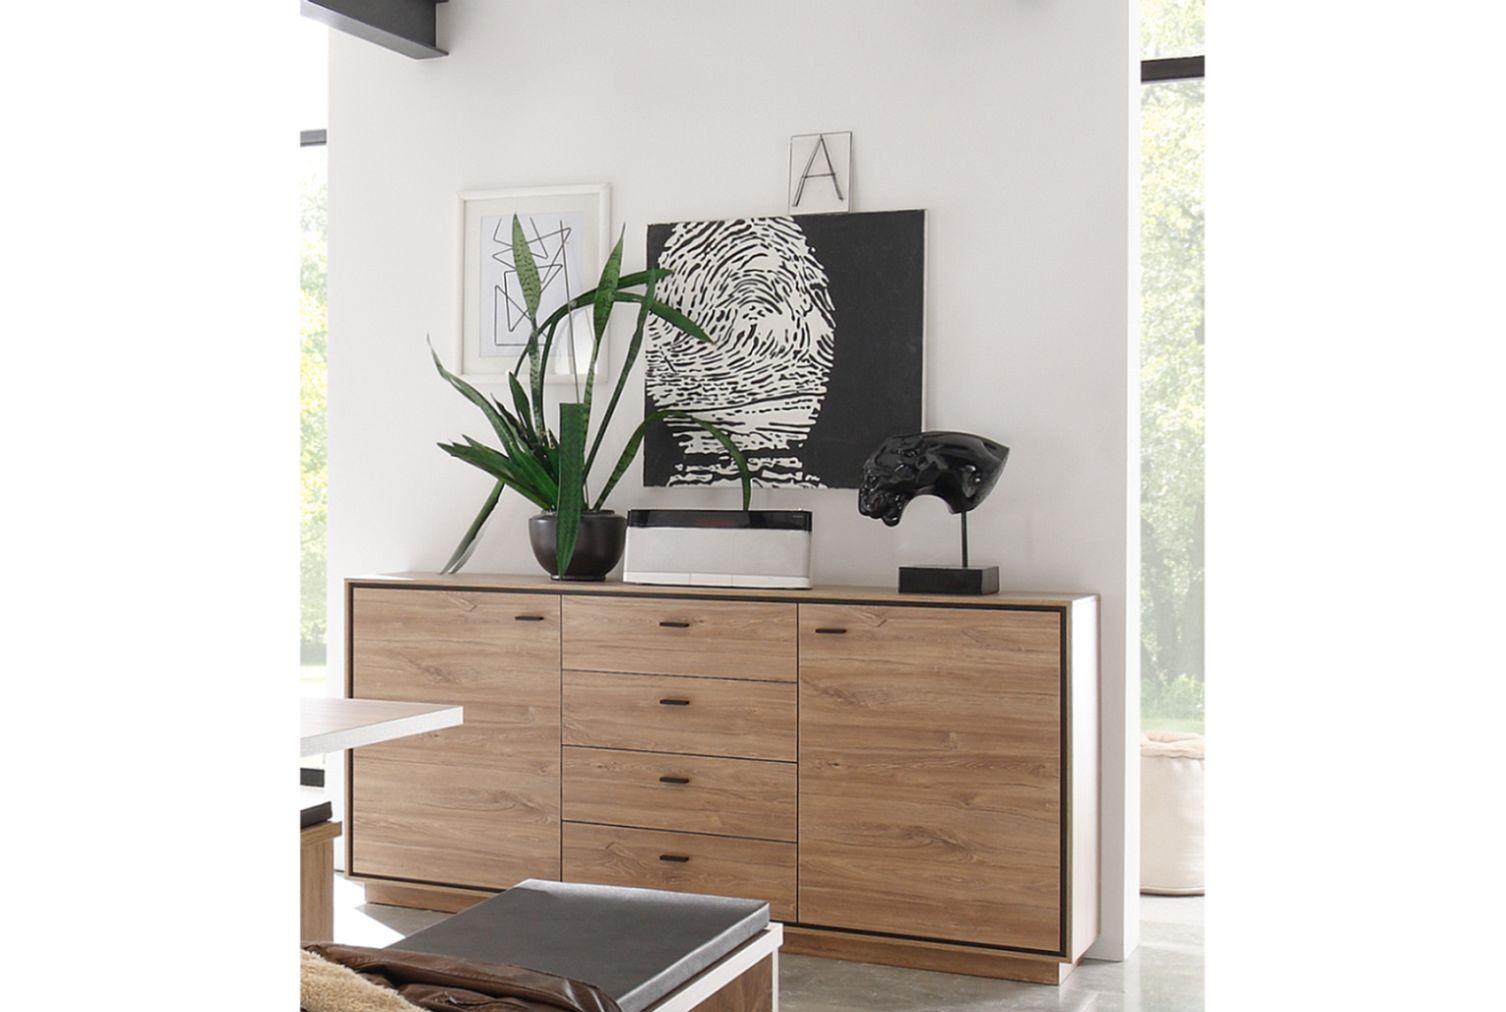 Salinas Sideboard 0641/24 stirling oak/schwarz matt